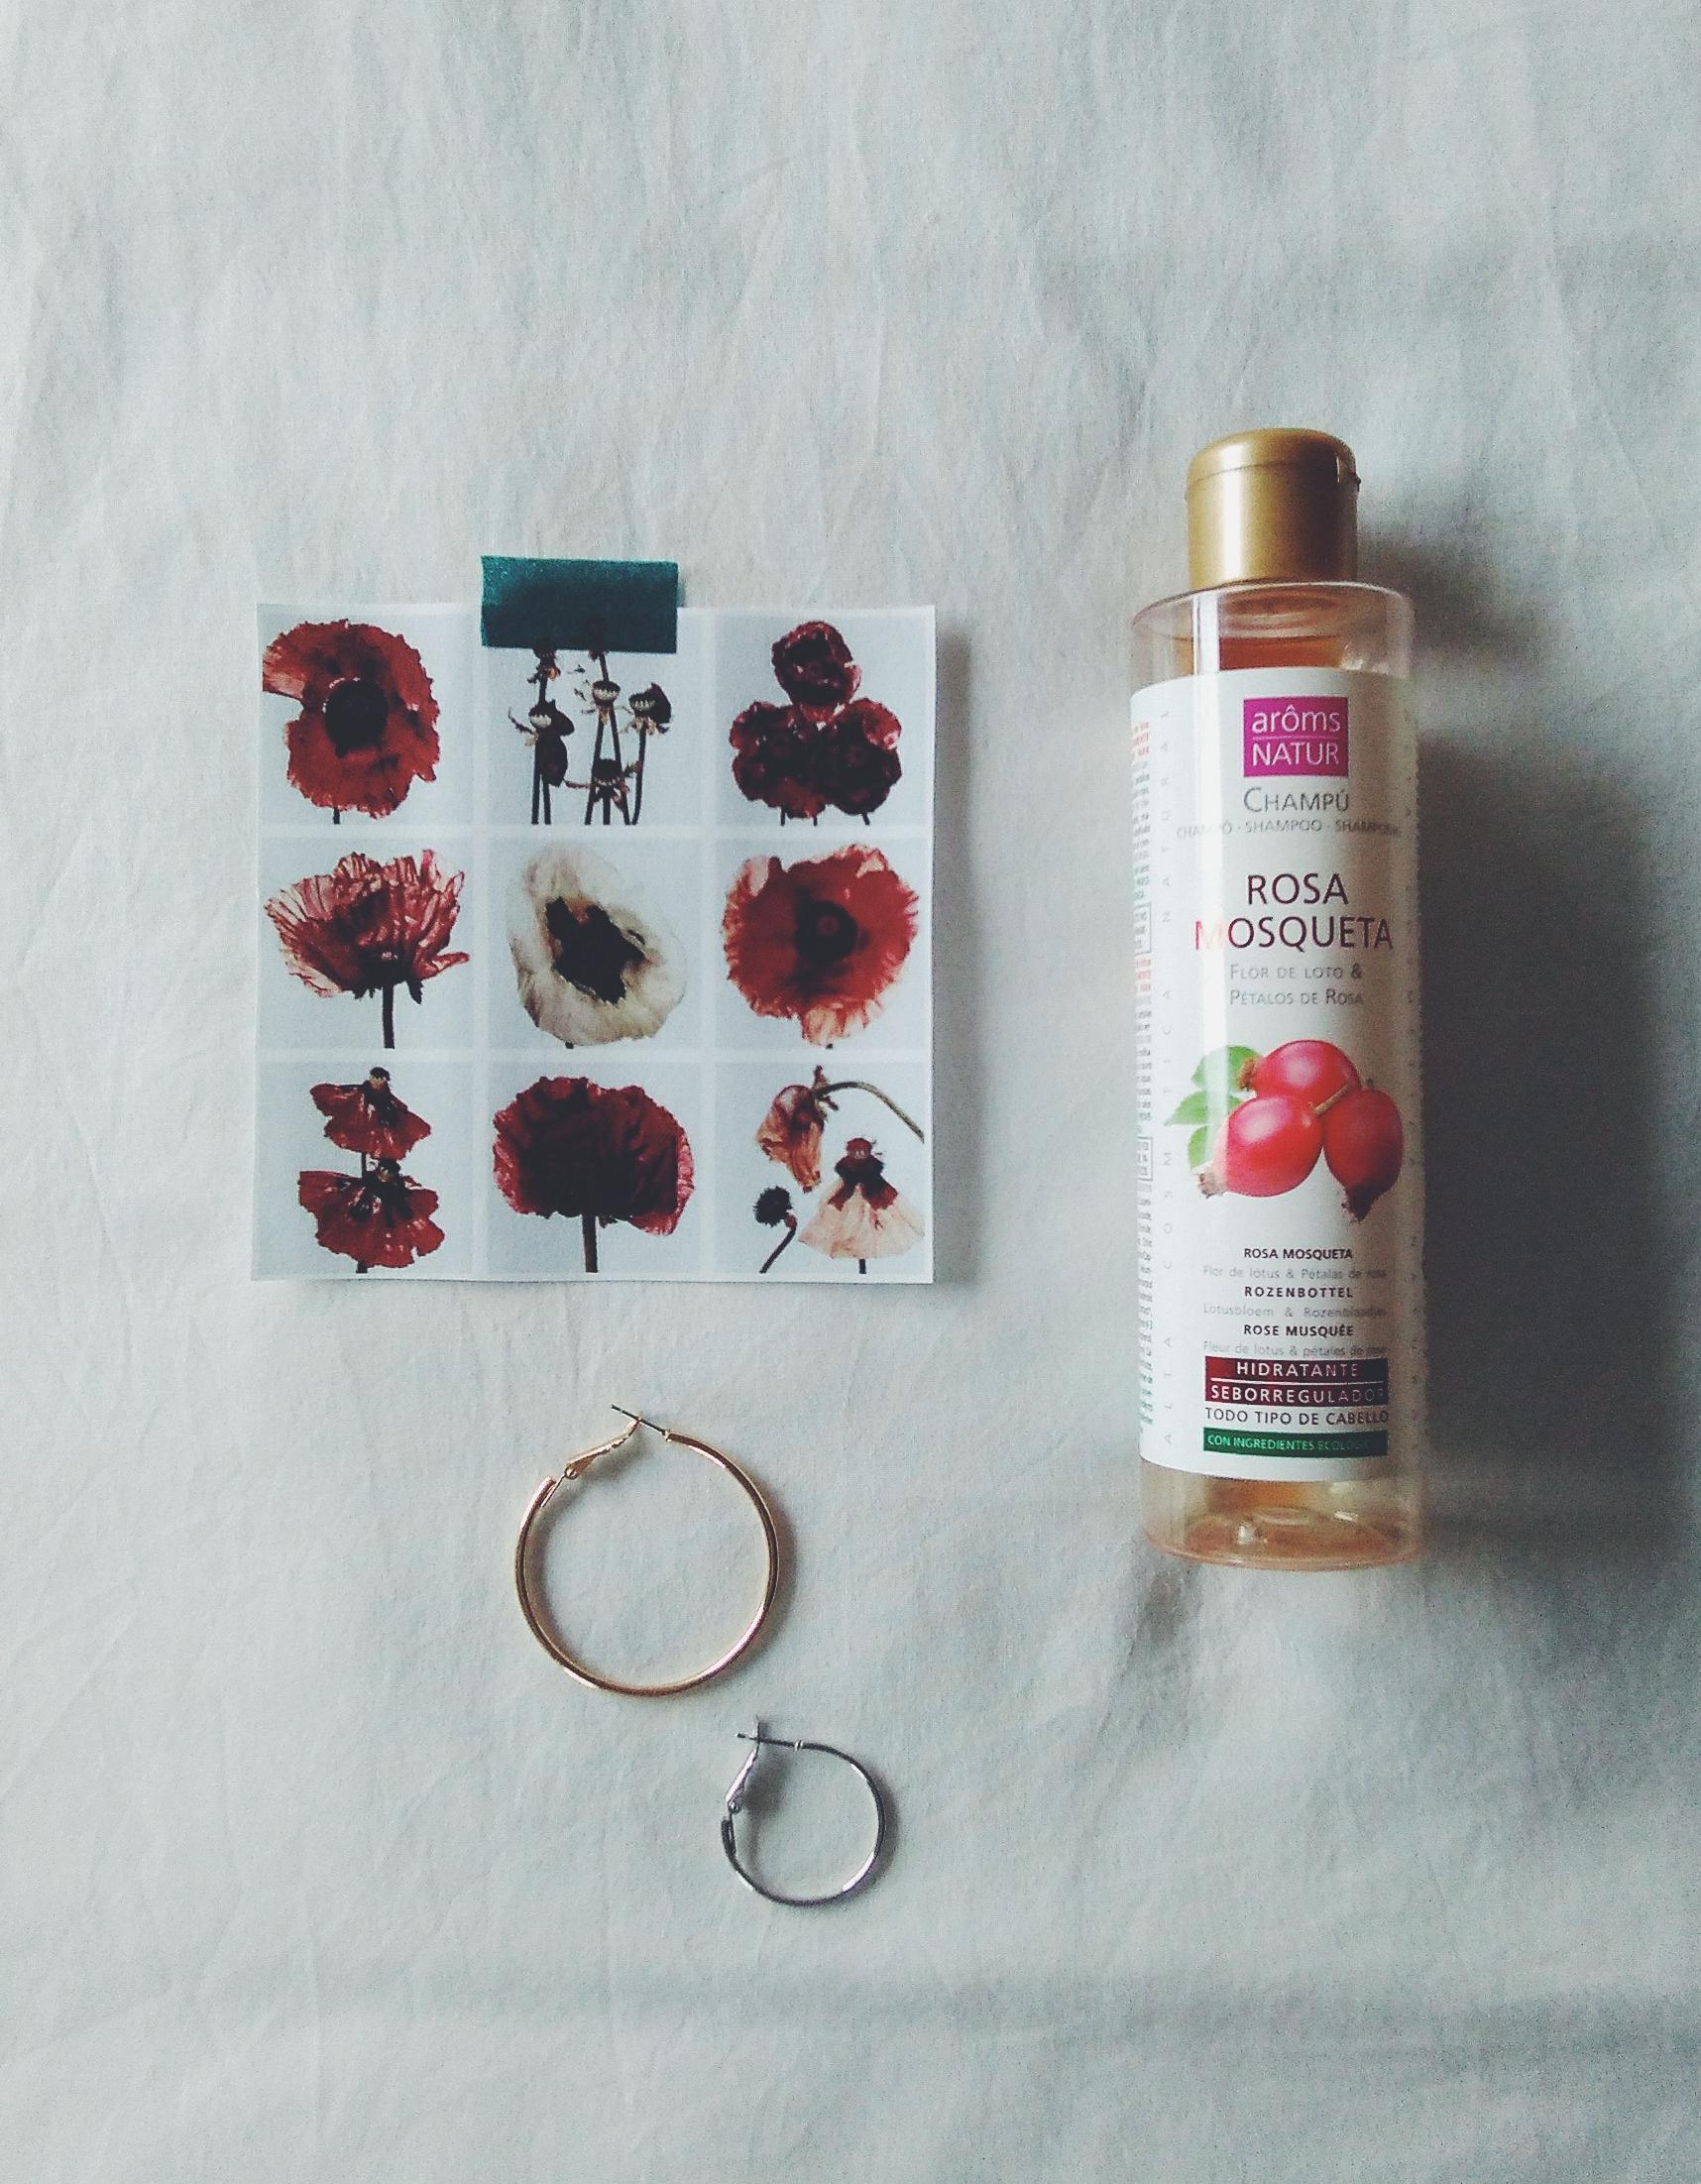 aroms nature rosehip oil shampoo